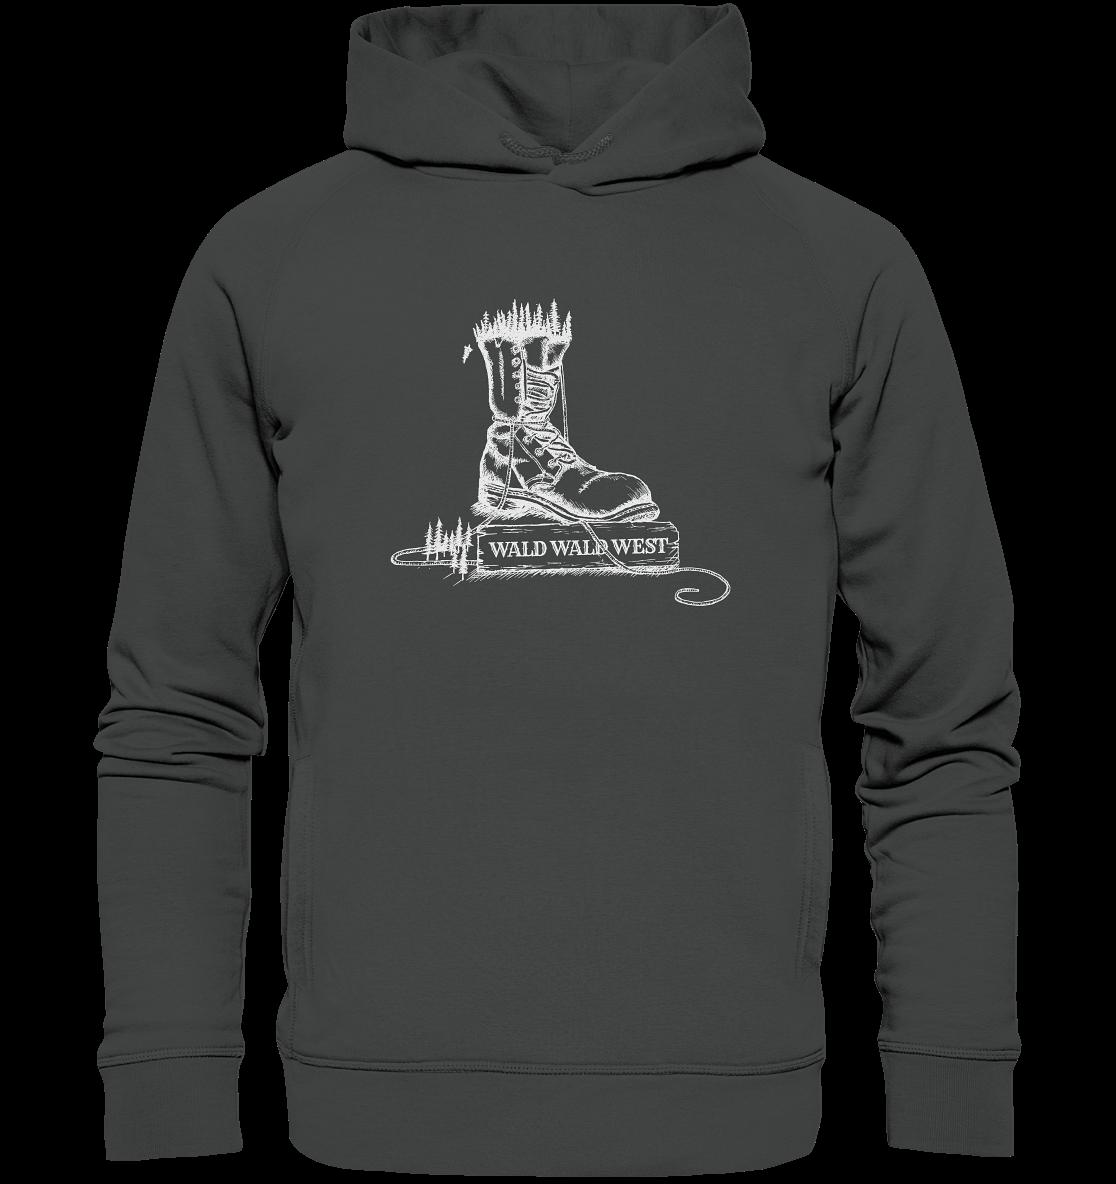 front-organic-fashion-hoodie-444545-1116x.png